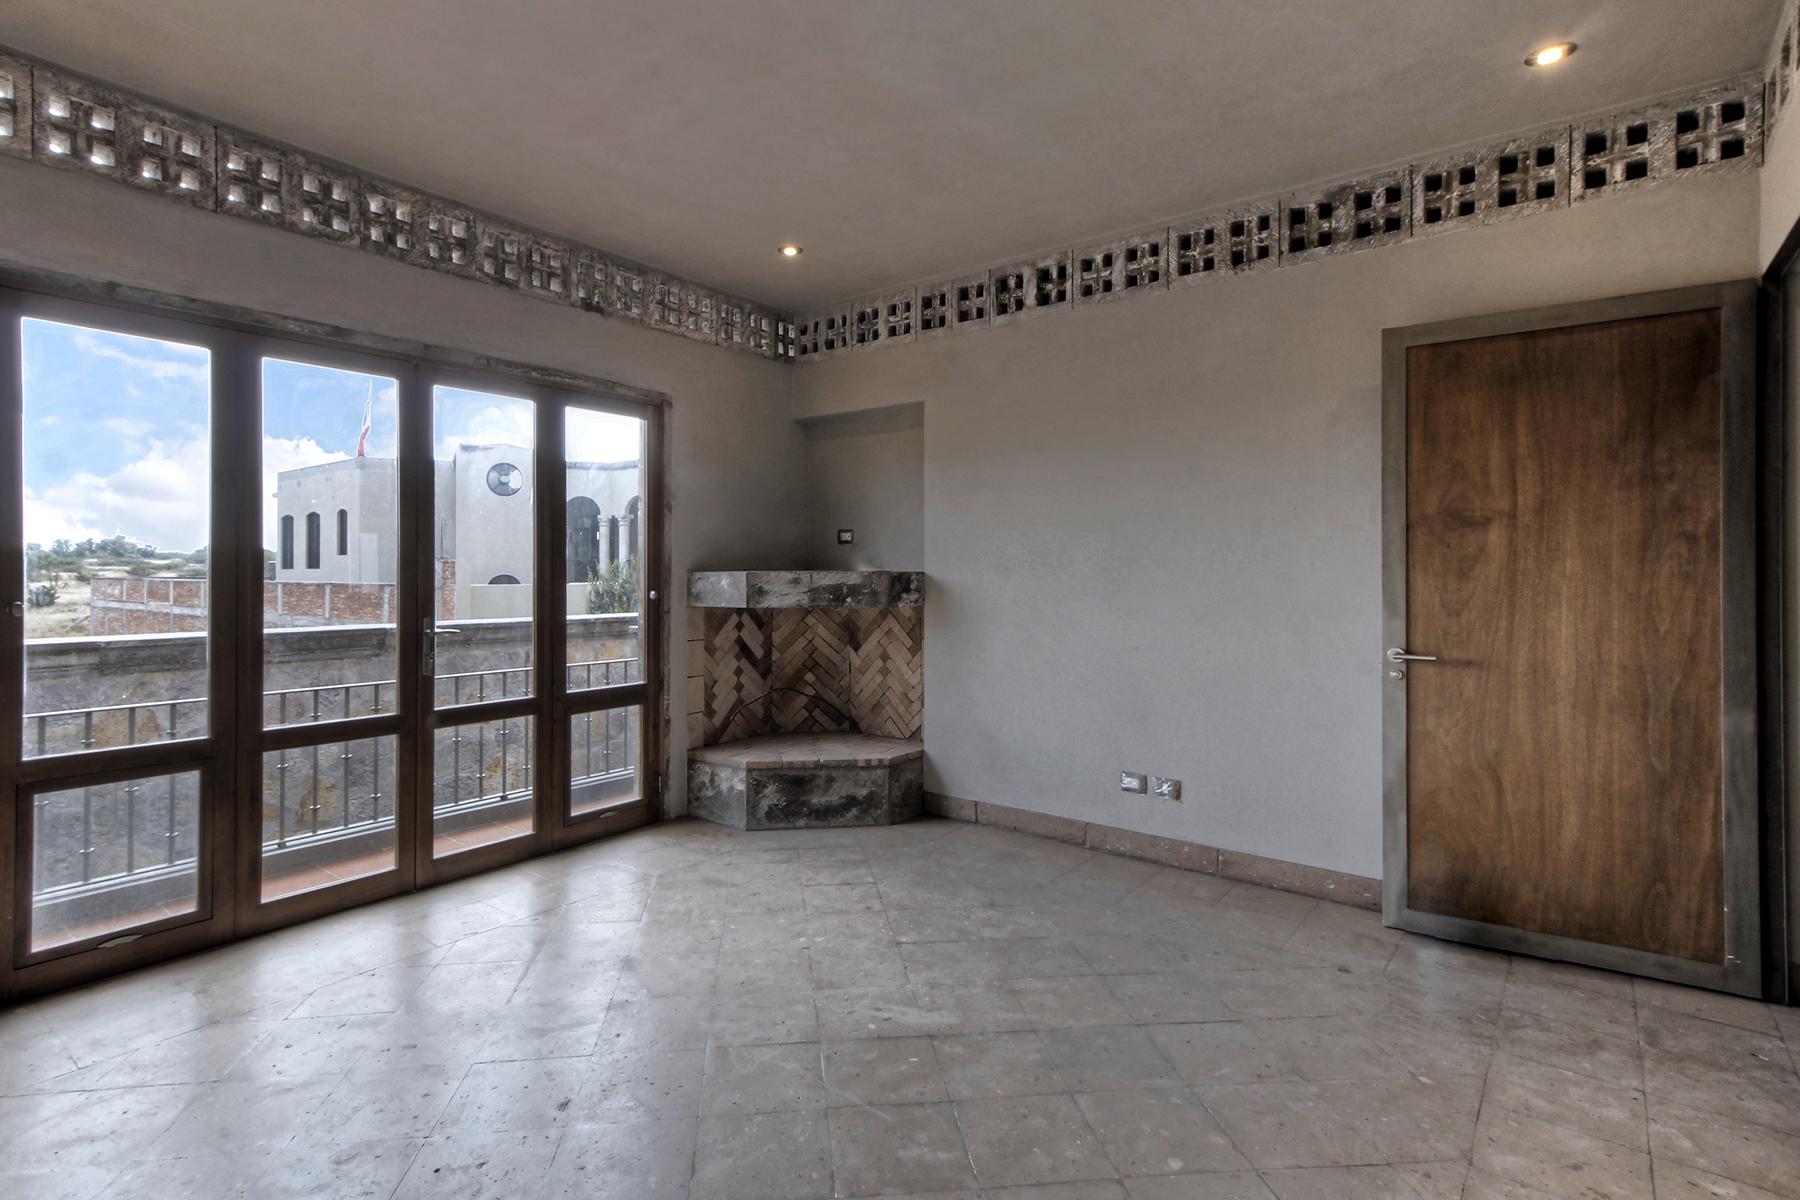 Additional photo for property listing at Palma de Mallorca  Other Guanajuato, Guanajuato 37710 México